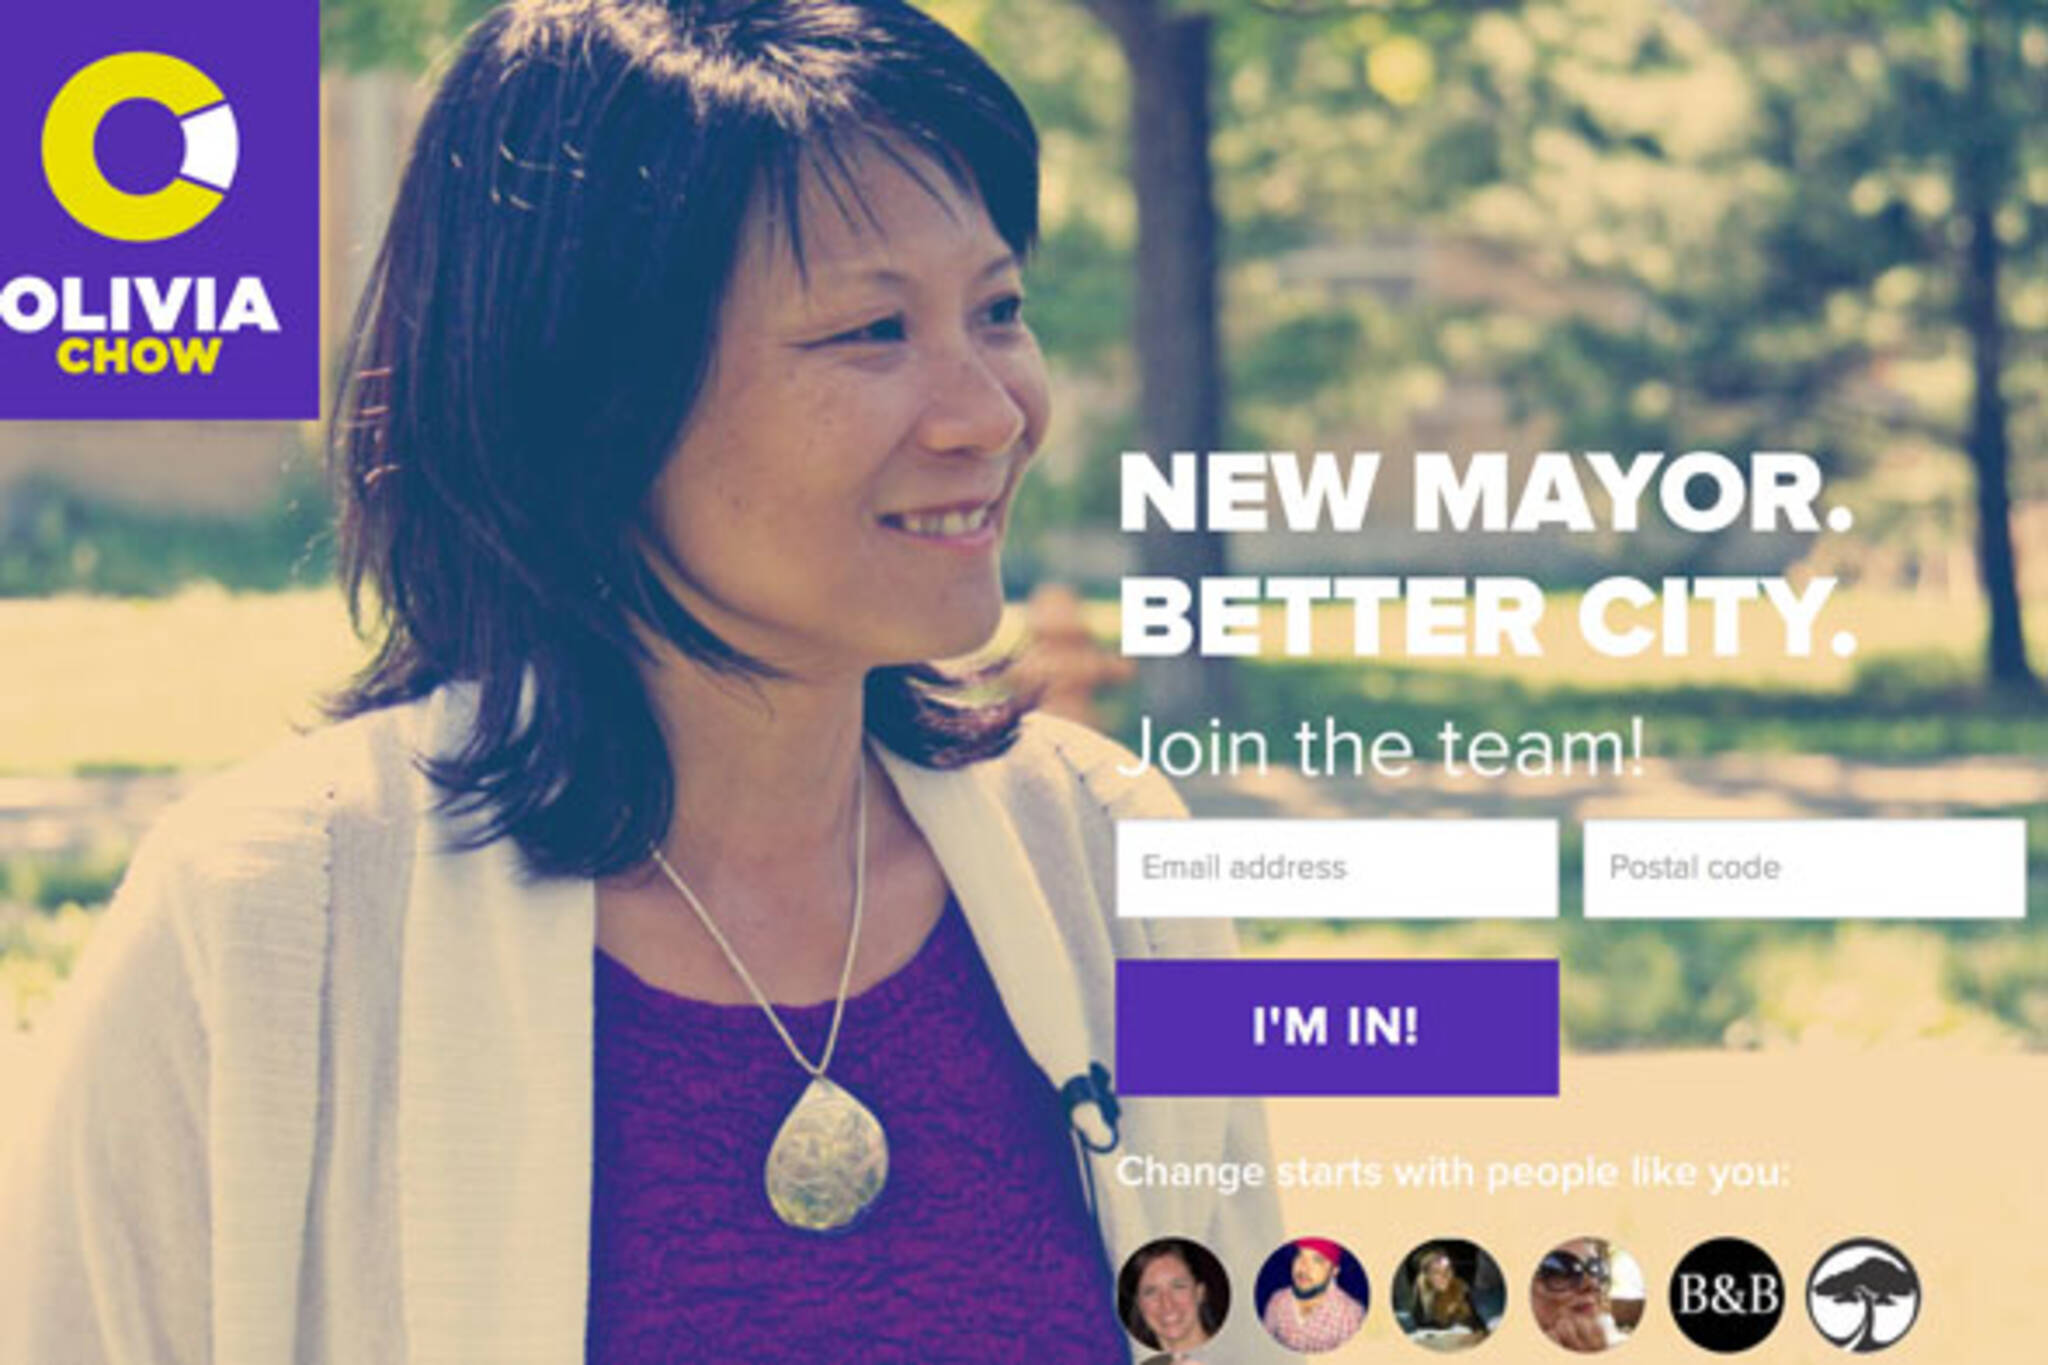 olivia chow mayor